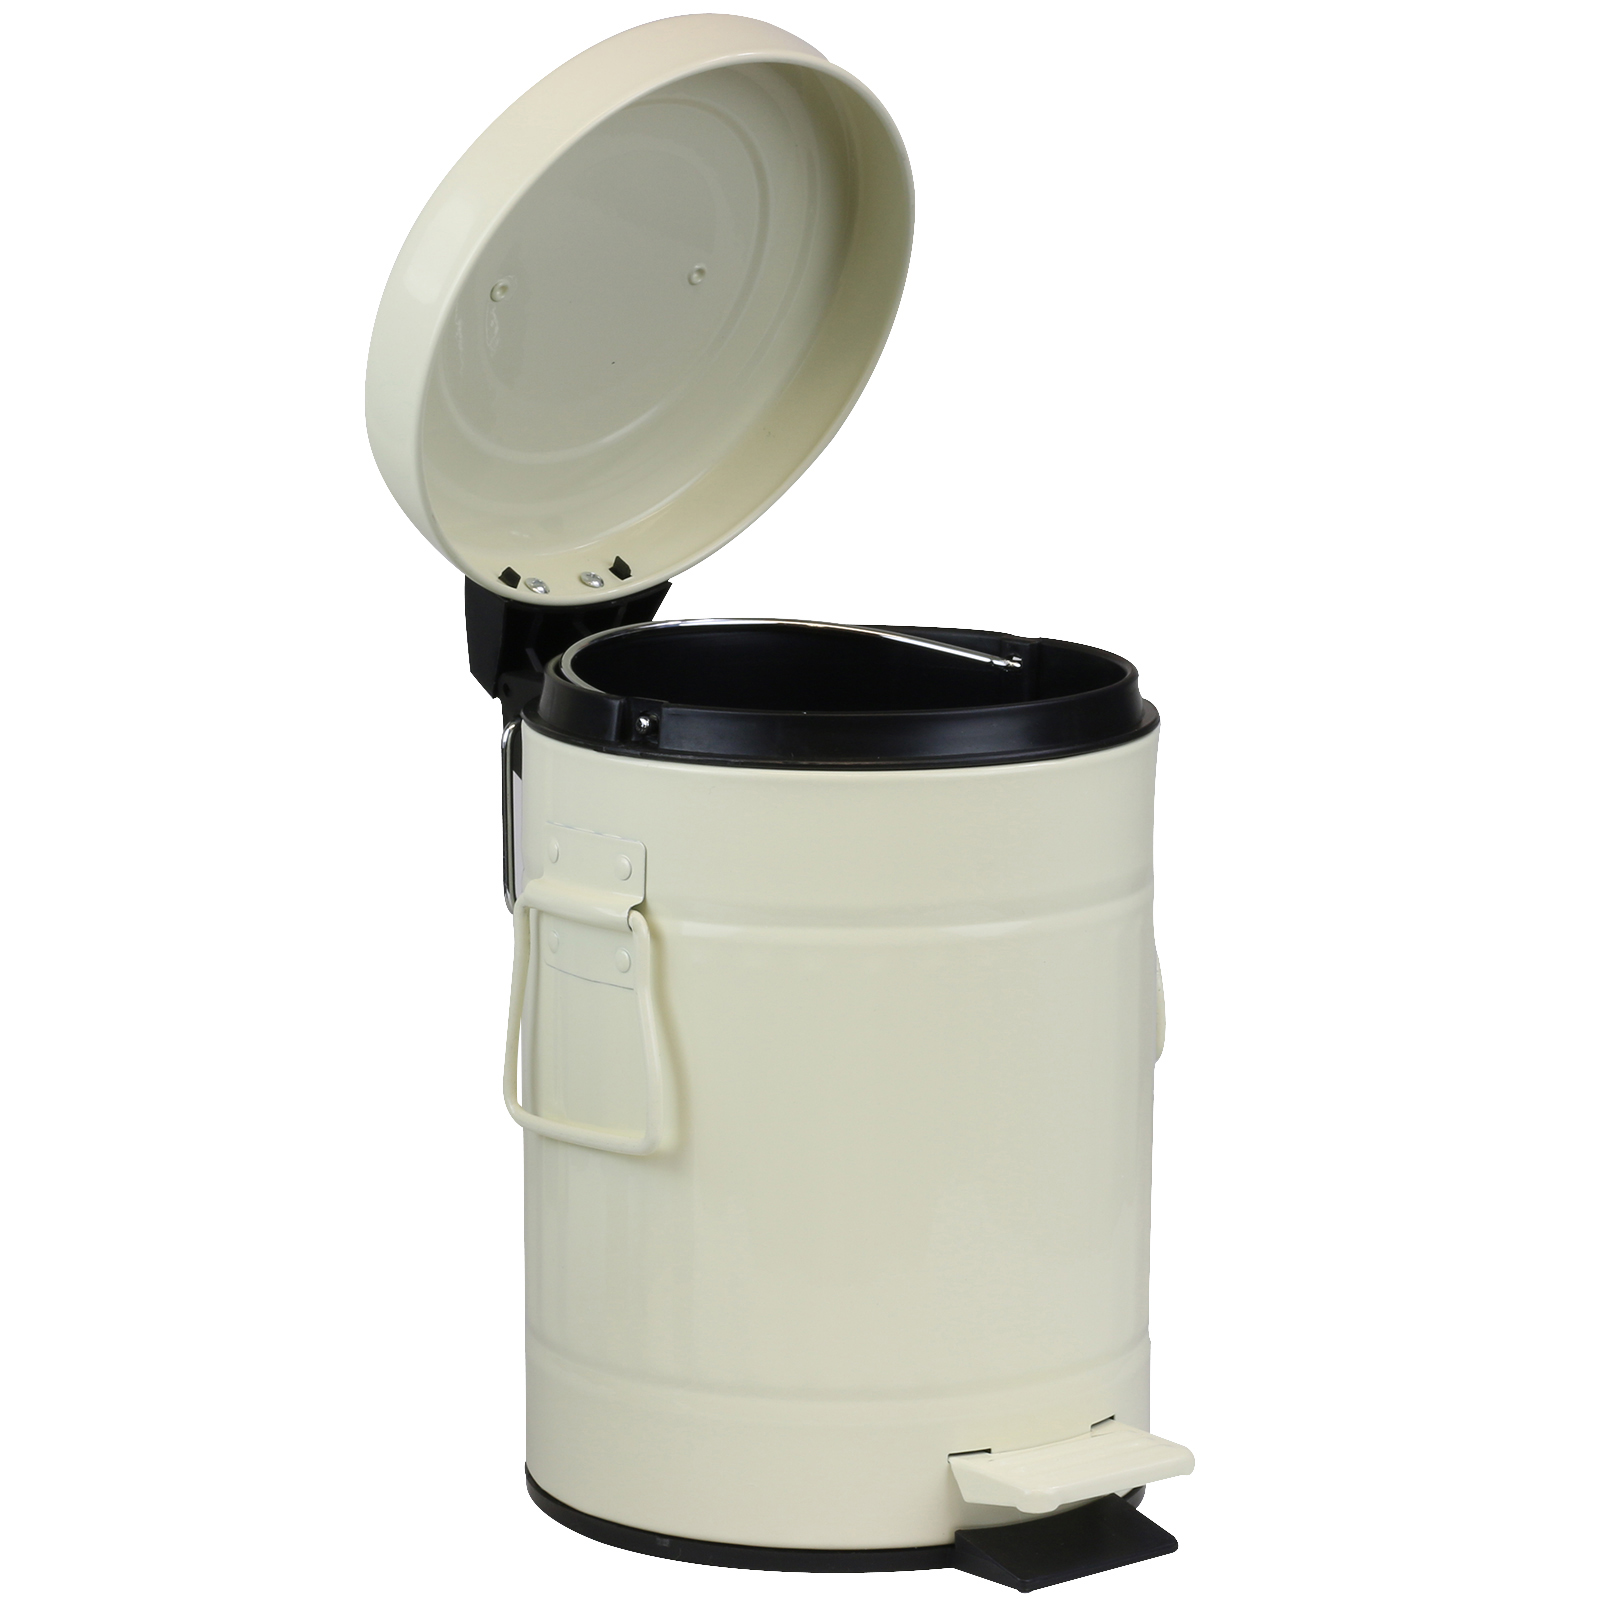 small metal pedal bin retro dustbin 3 litre bathroom toilet office waste rubbish ebay. Black Bedroom Furniture Sets. Home Design Ideas